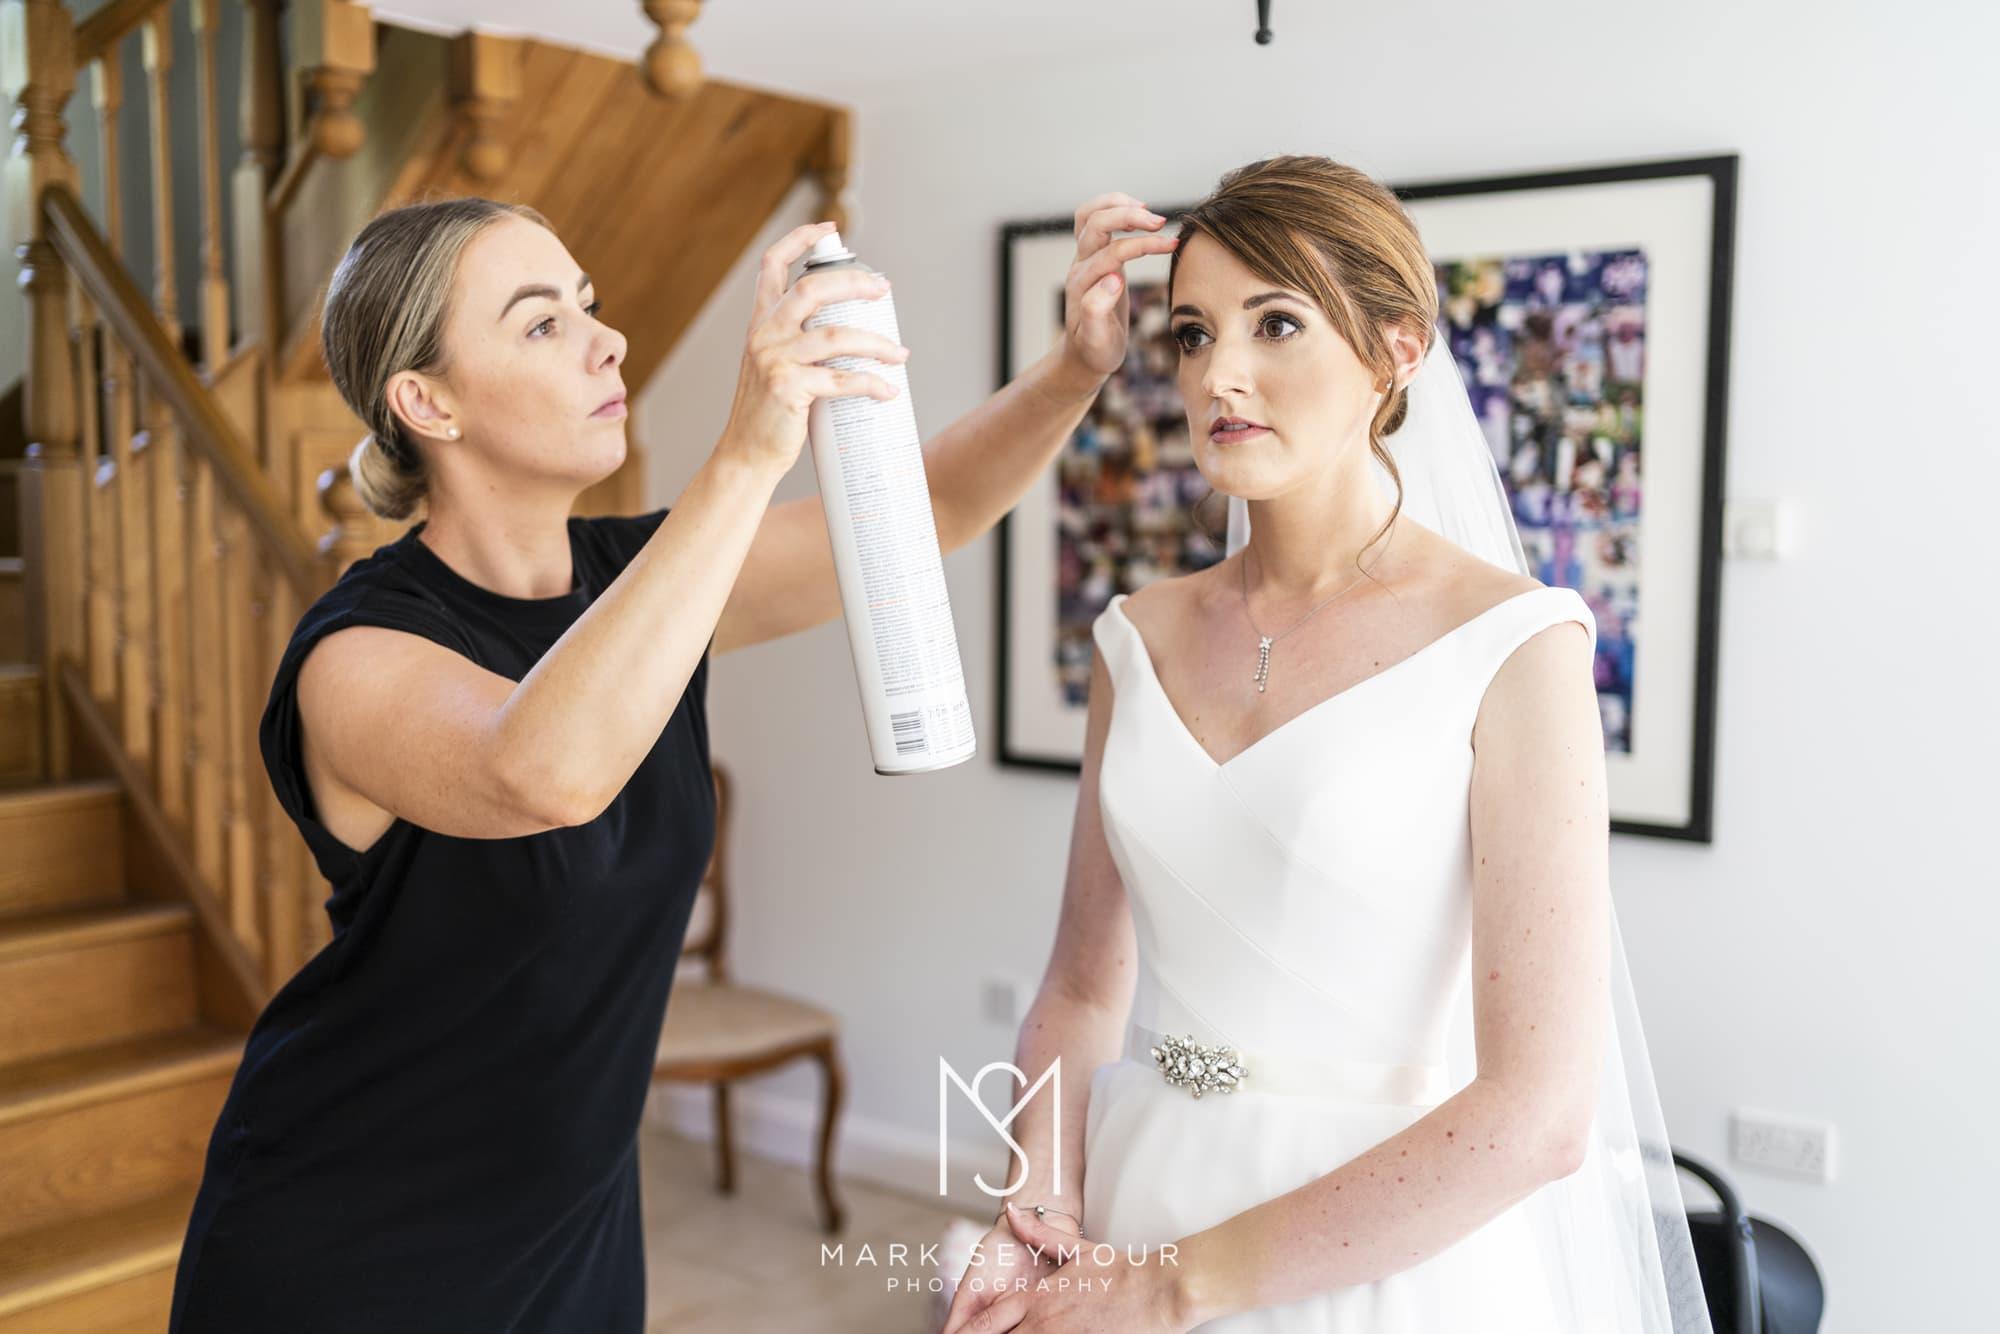 Barnsley House Wedding Photographer - Olivia and James' wedding 4